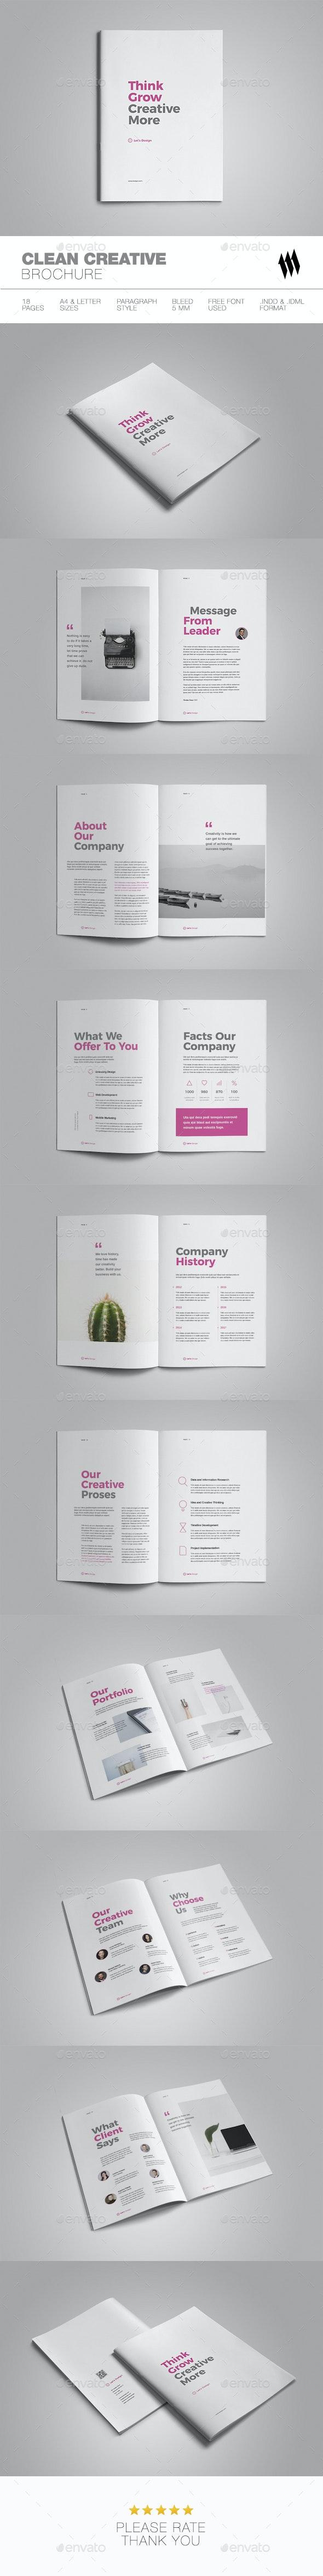 Clean Creative Brochure - Brochures Print Templates